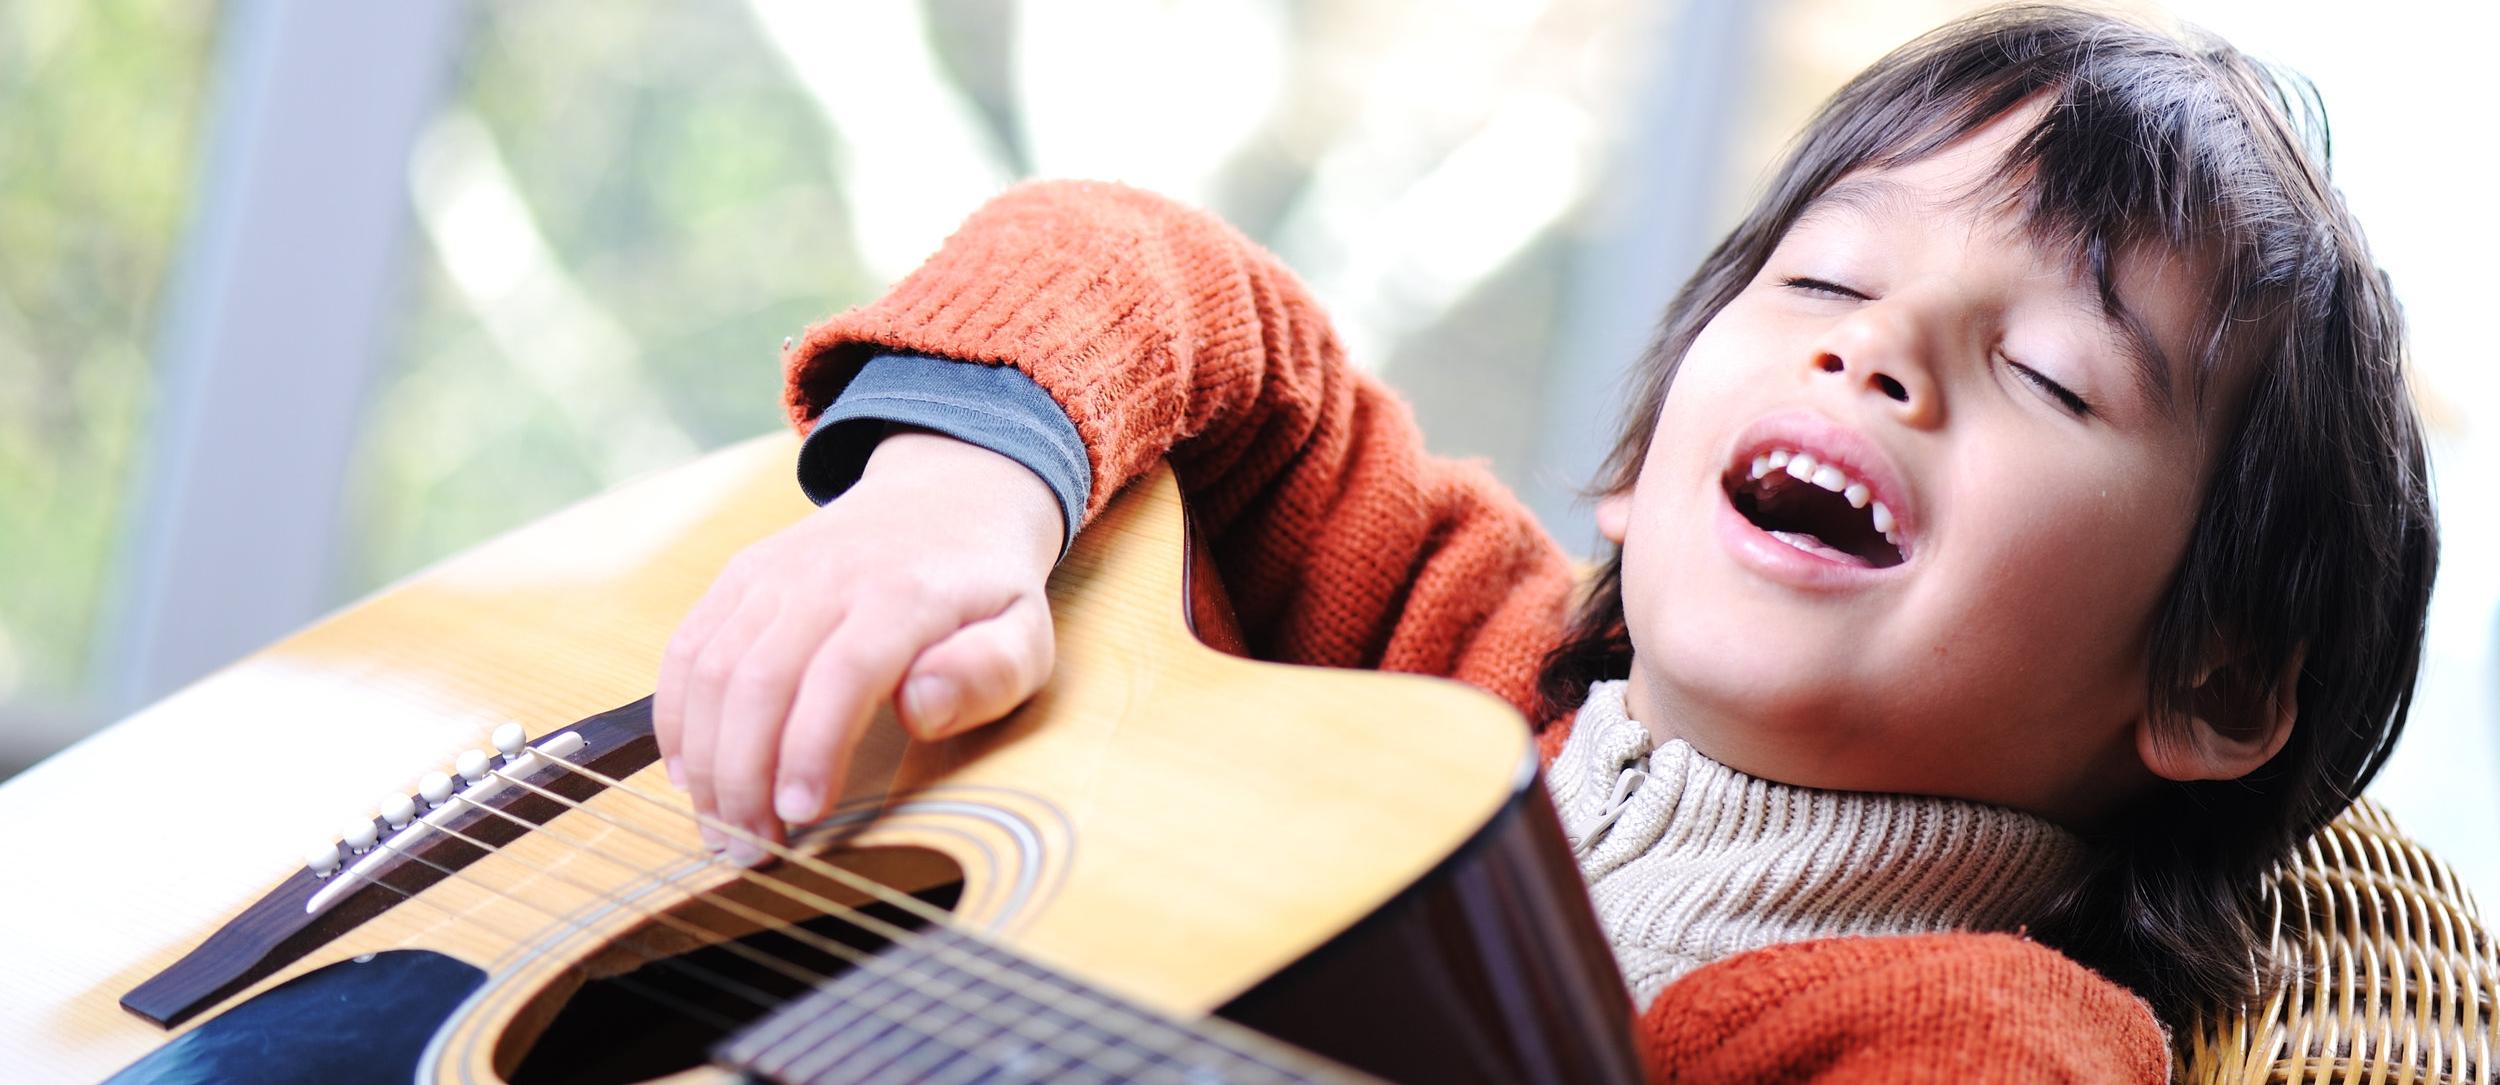 shutterstock_92907151 boy with guitar.jpg